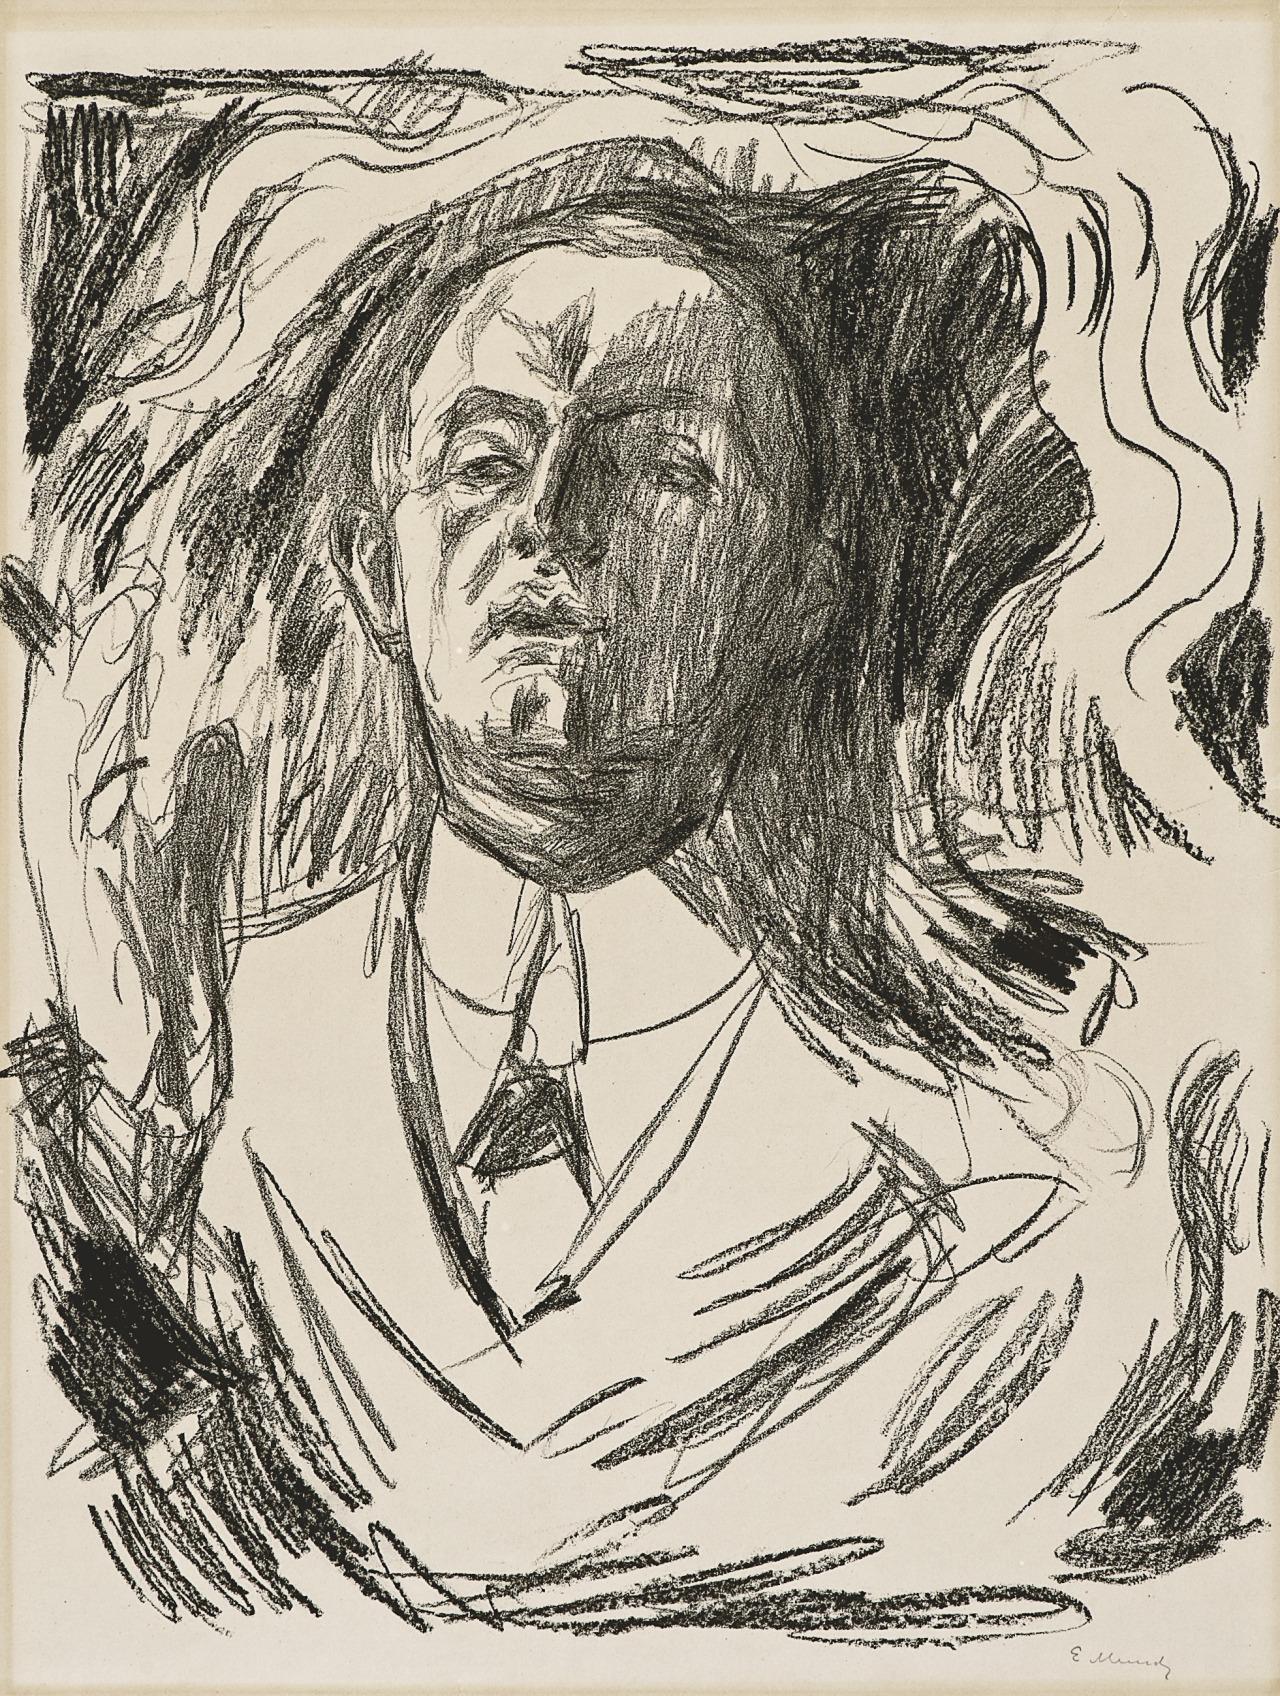 amare-habeo:Edvard Munch(Norwegian, 1863-1944)Self-Portrait with cigar, 1908